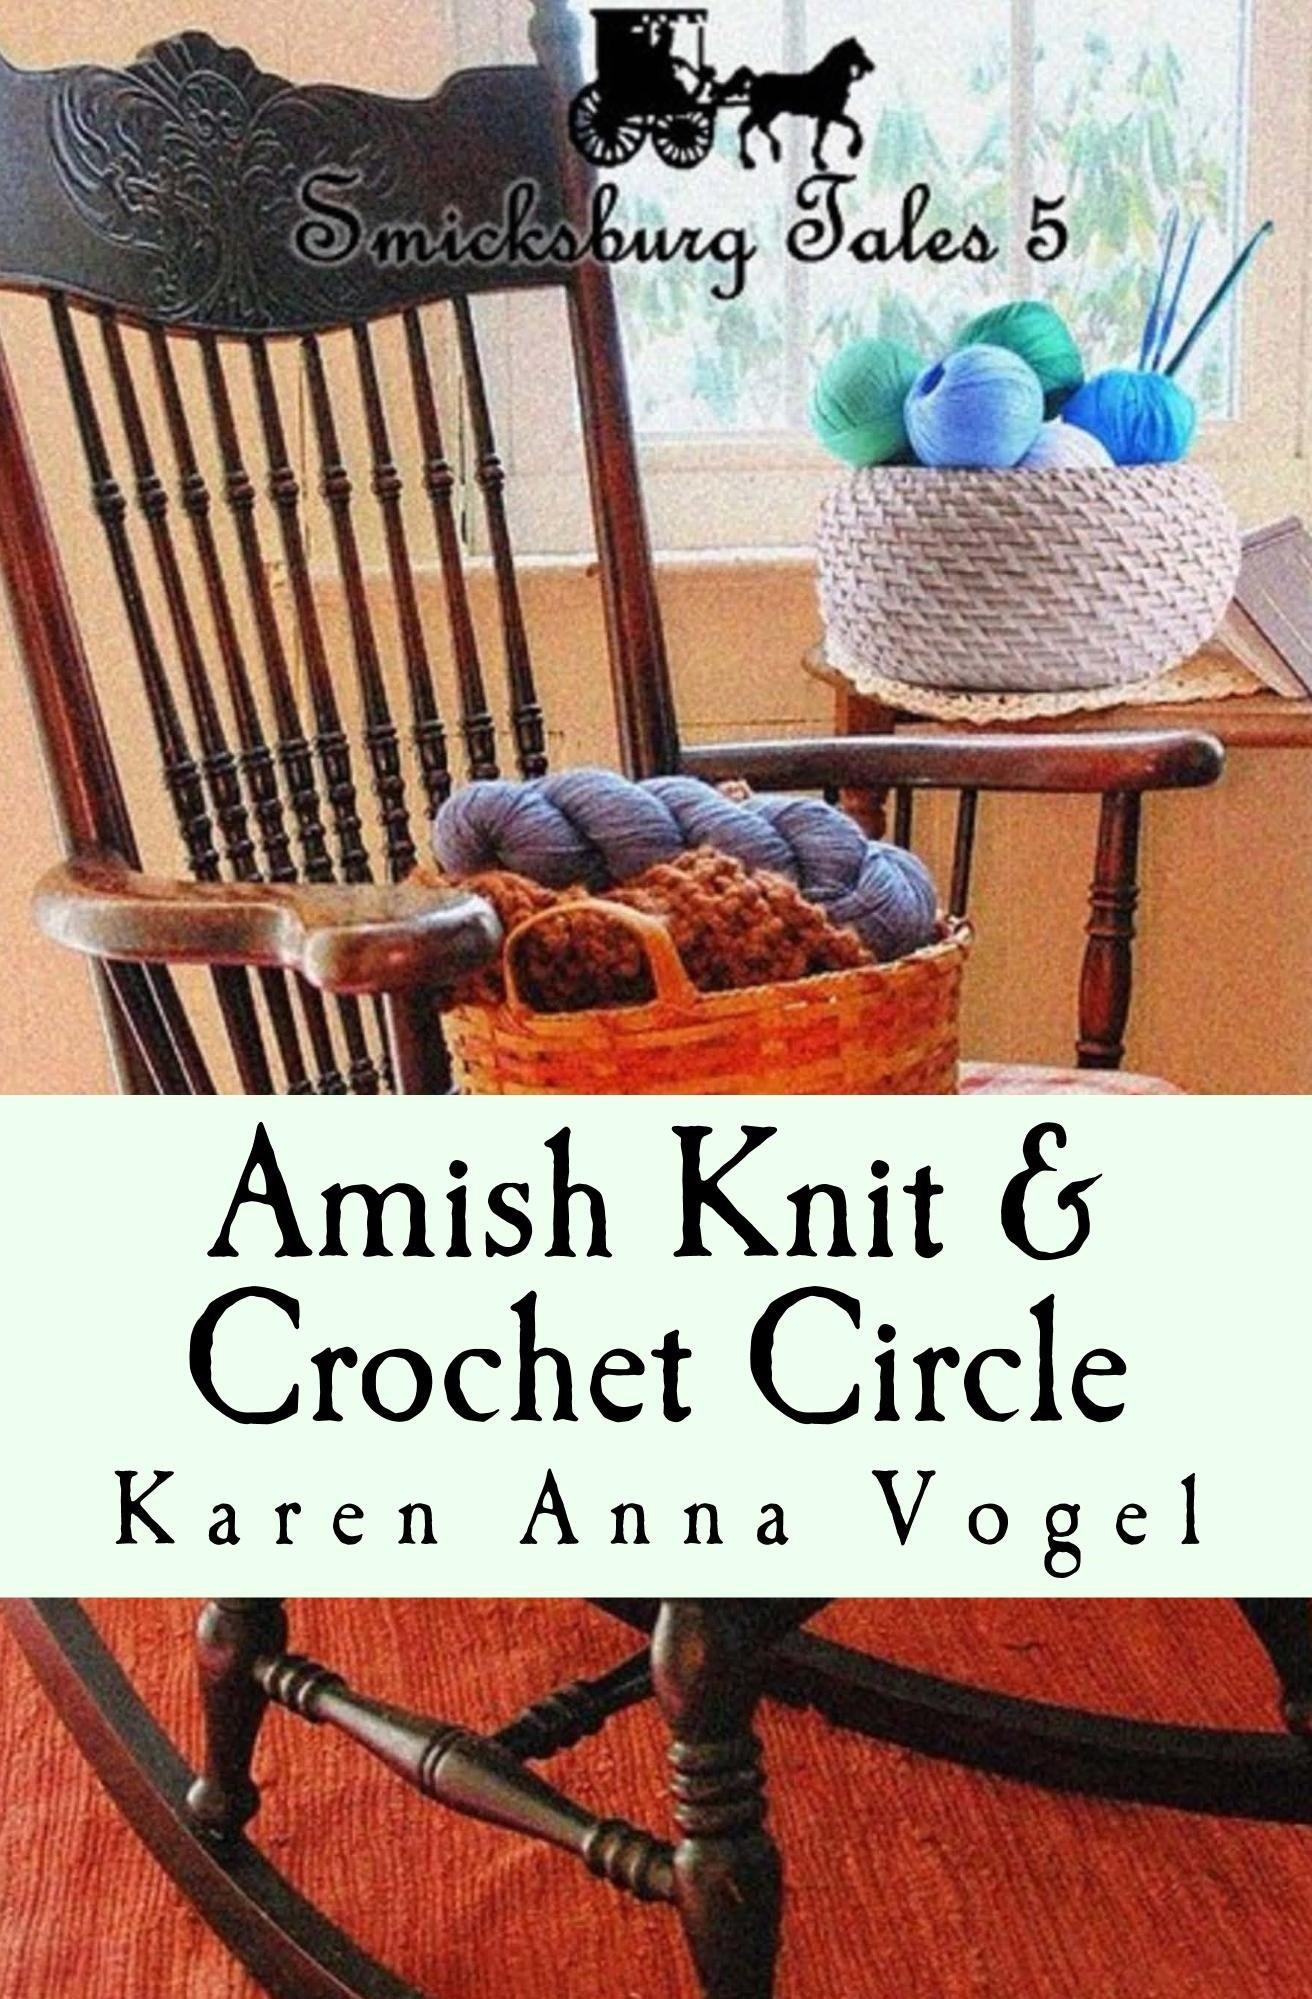 Circle Crochet Family – Crochet — Learn How to Crochet